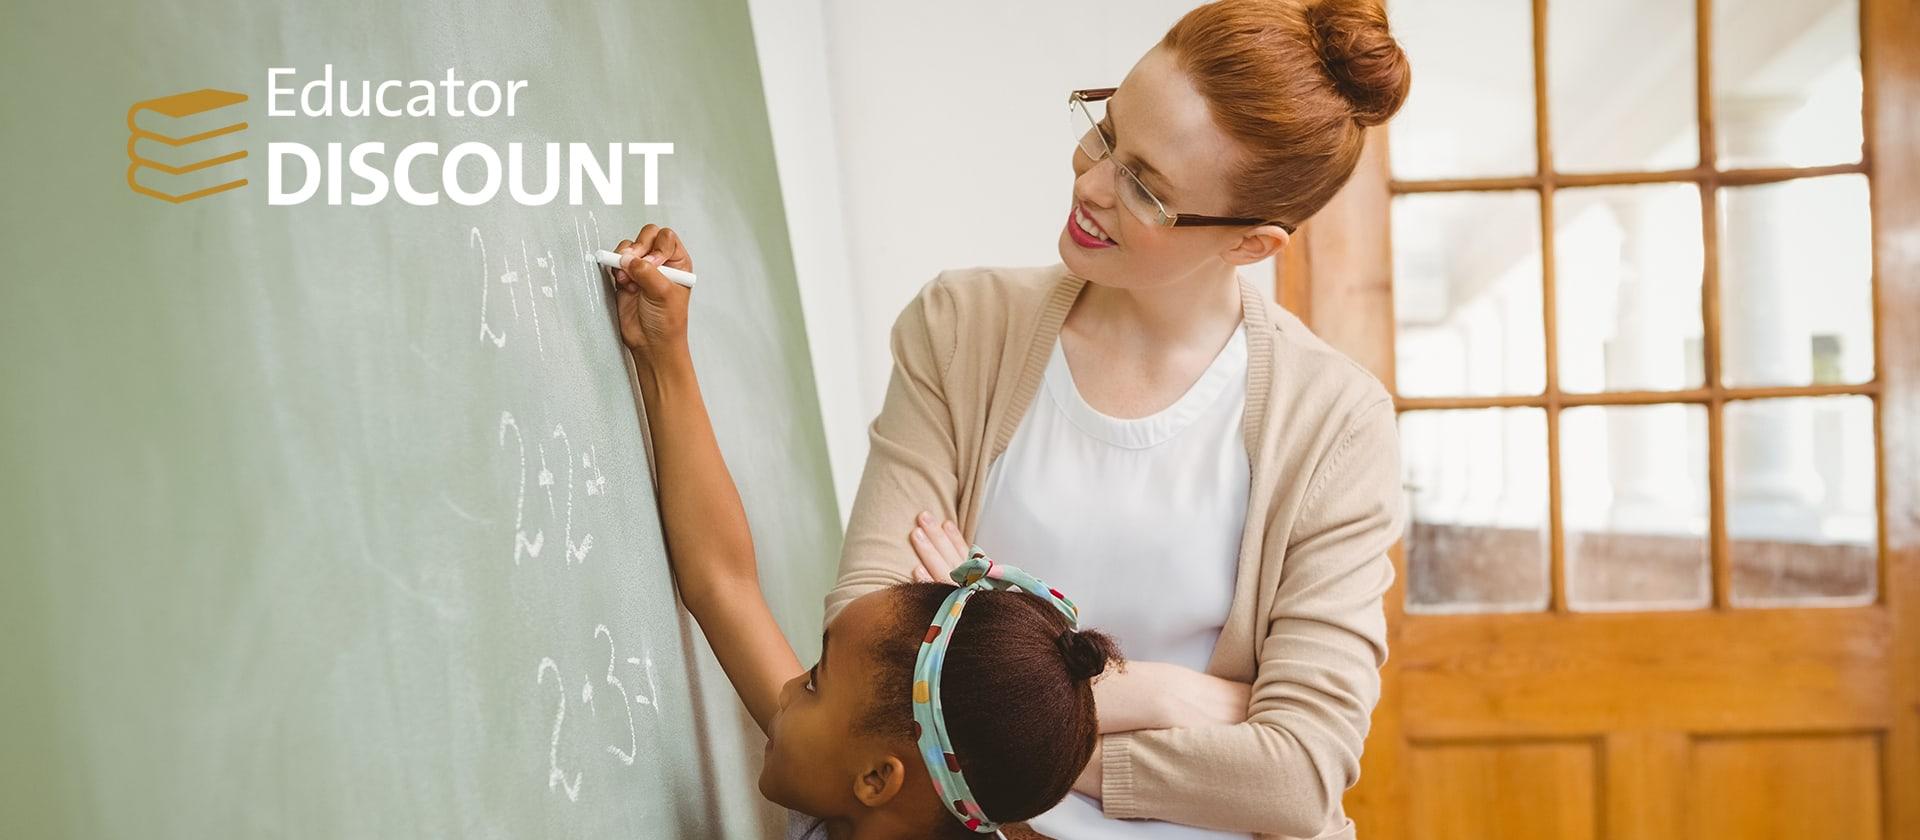 Chevy Educator Discount